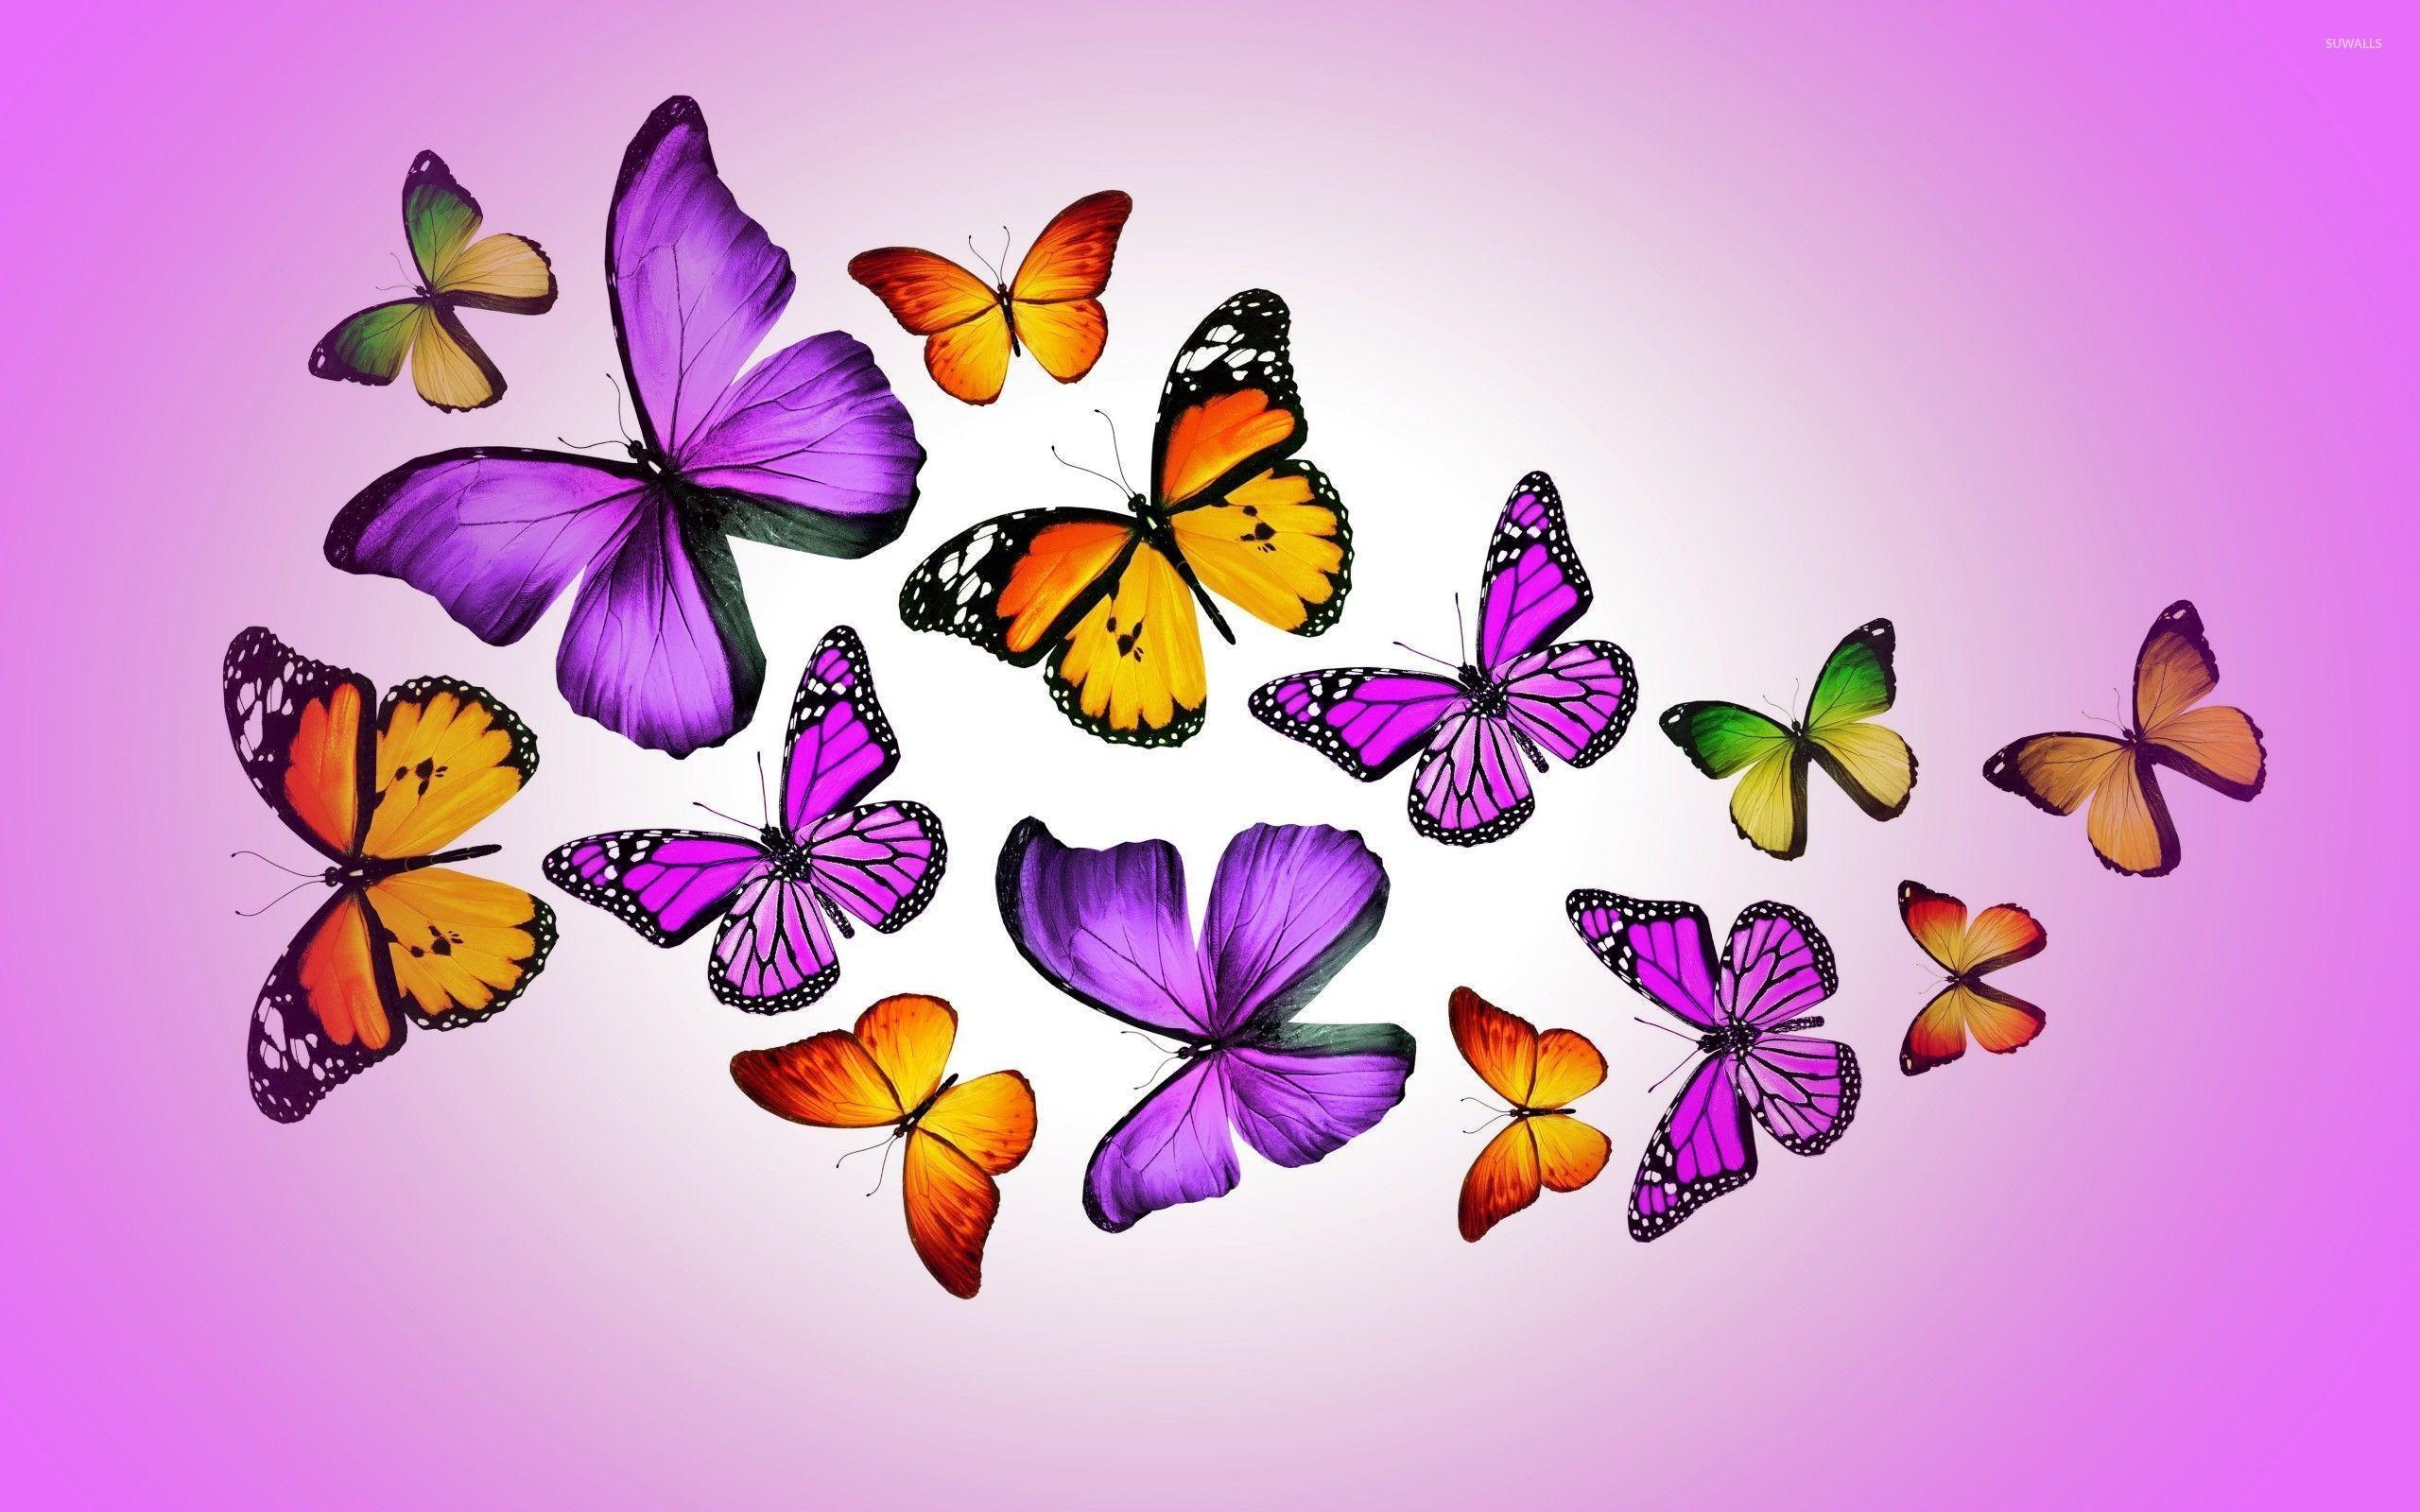 Pink And Purple Butterfly Wallpaper - Monarch Butterfly , HD Wallpaper & Backgrounds